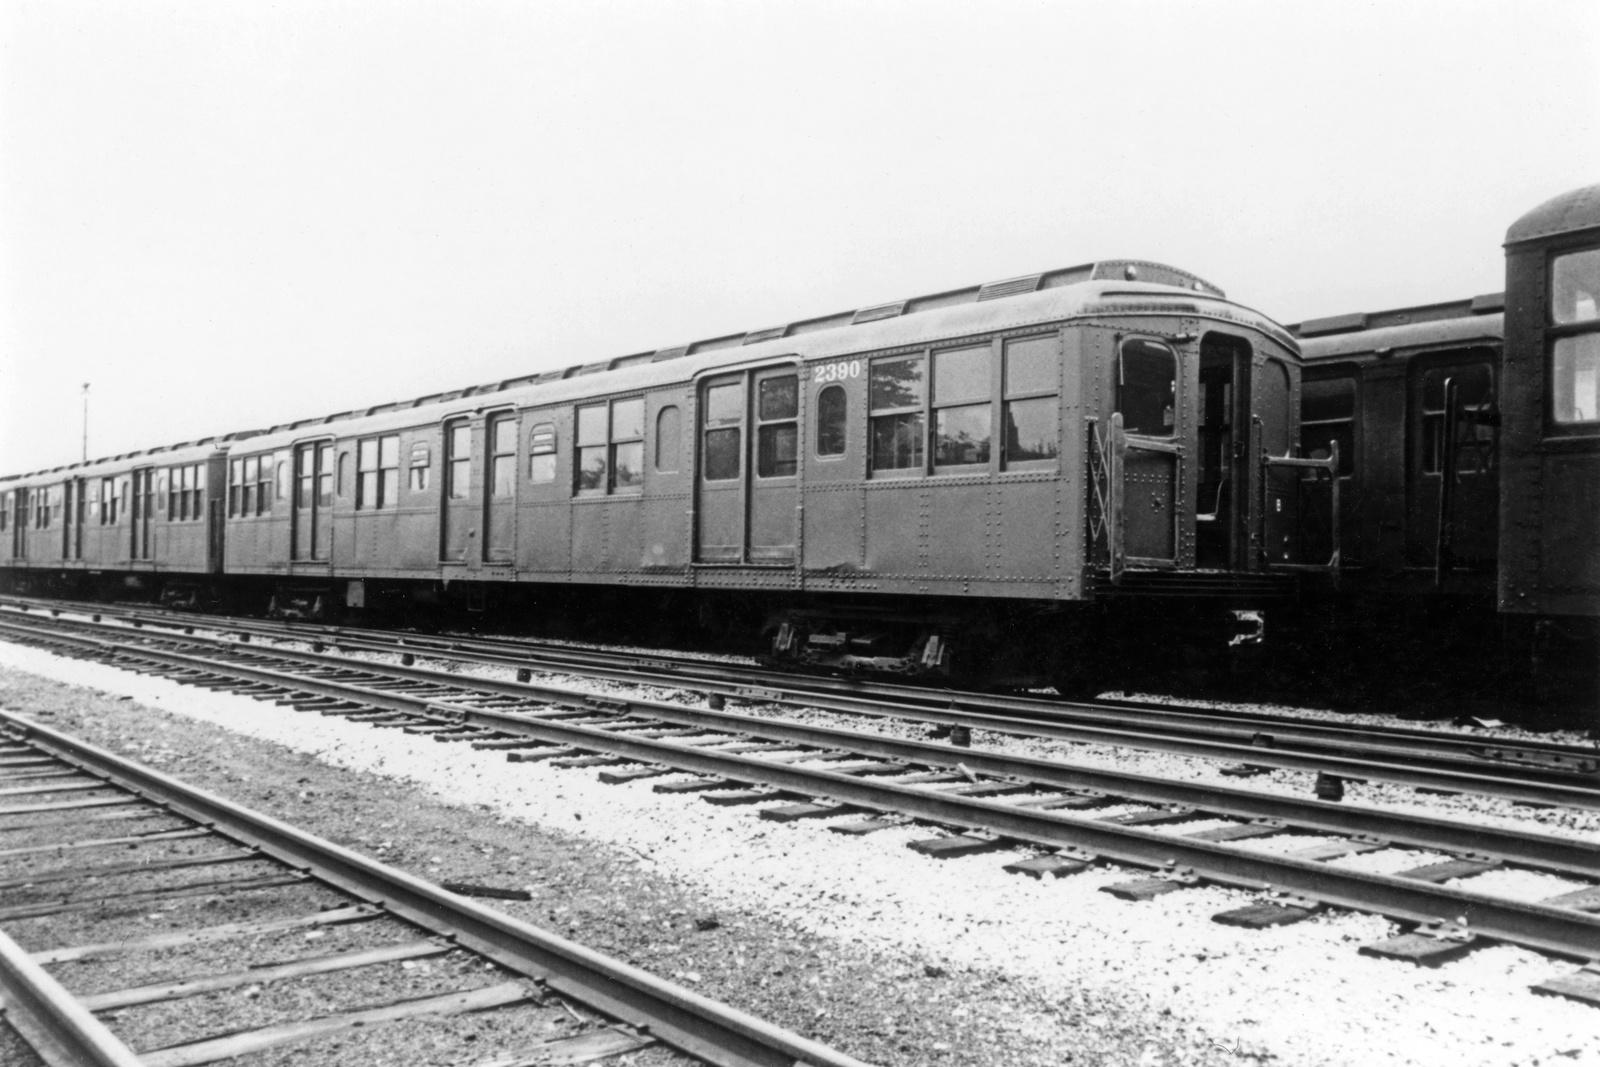 (269k, 1024x787)<br><b>Country:</b> United States<br><b>City:</b> New York<br><b>System:</b> New York City Transit<br><b>Location:</b> Fresh Pond Yard<br><b>Car:</b> BMT A/B-Type Standard 2390 <br><b>Photo by:</b> Ed Watson/Arthur Lonto Collection<br><b>Collection of:</b> Frank Pfuhler<br><b>Date:</b> 9/16/1965<br><b>Viewed (this week/total):</b> 3 / 869